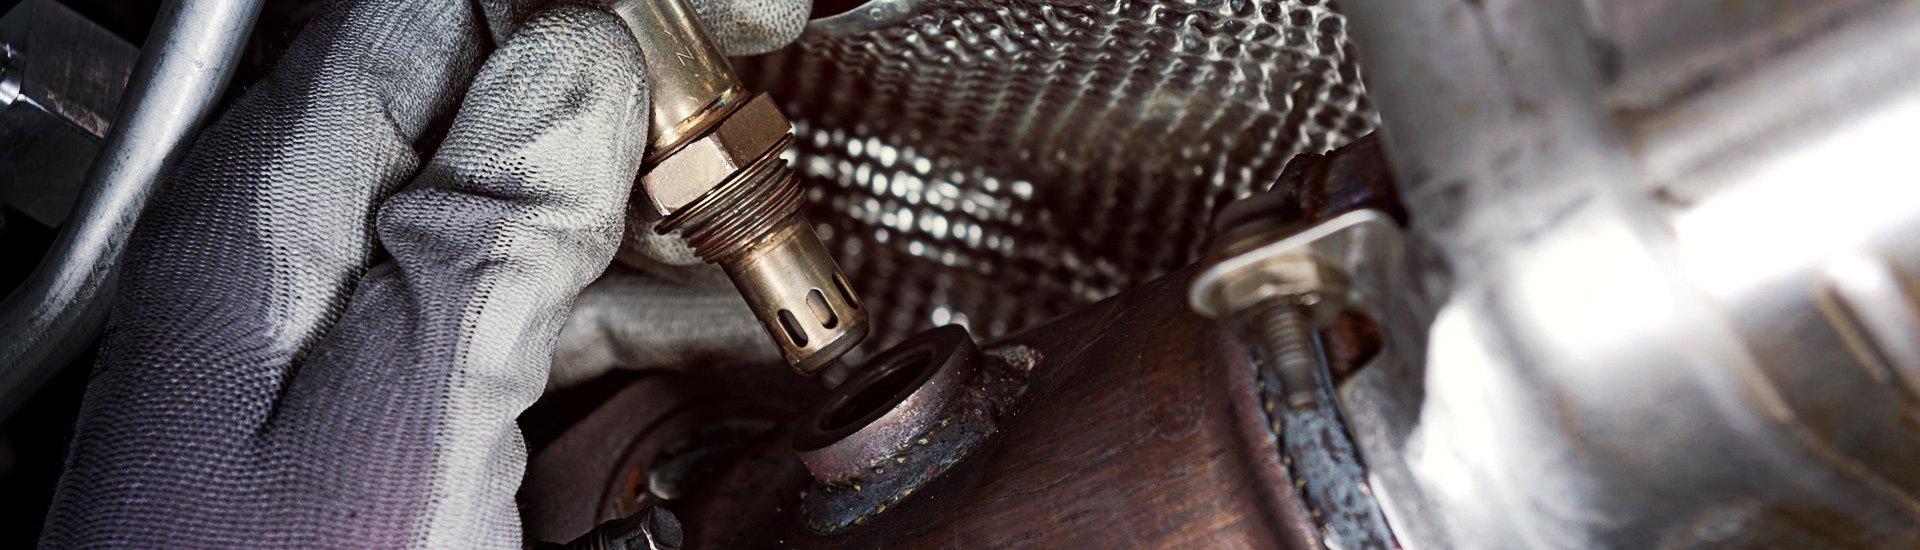 Replacement Emission Control Parts